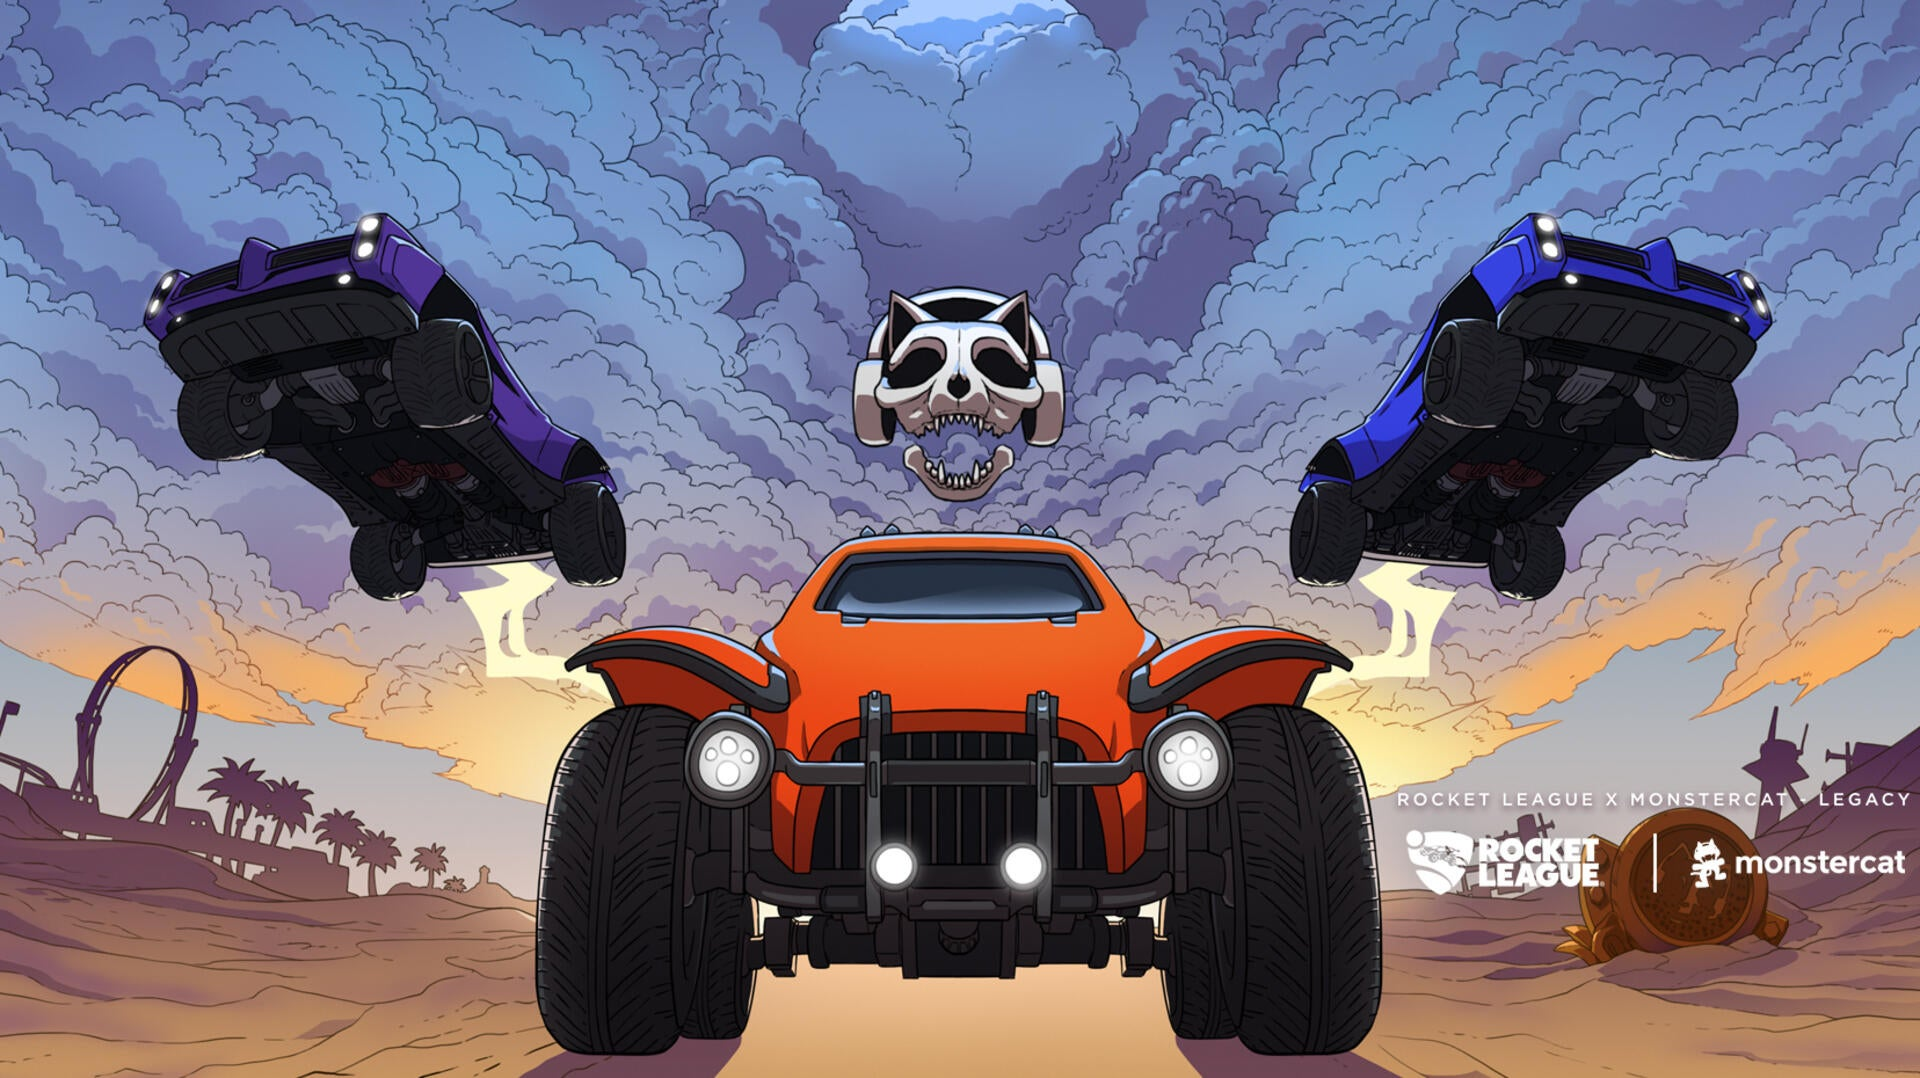 [Resim: Rocket-League-X-Monstercat---Legacy-Bann...575bb1.jpg]